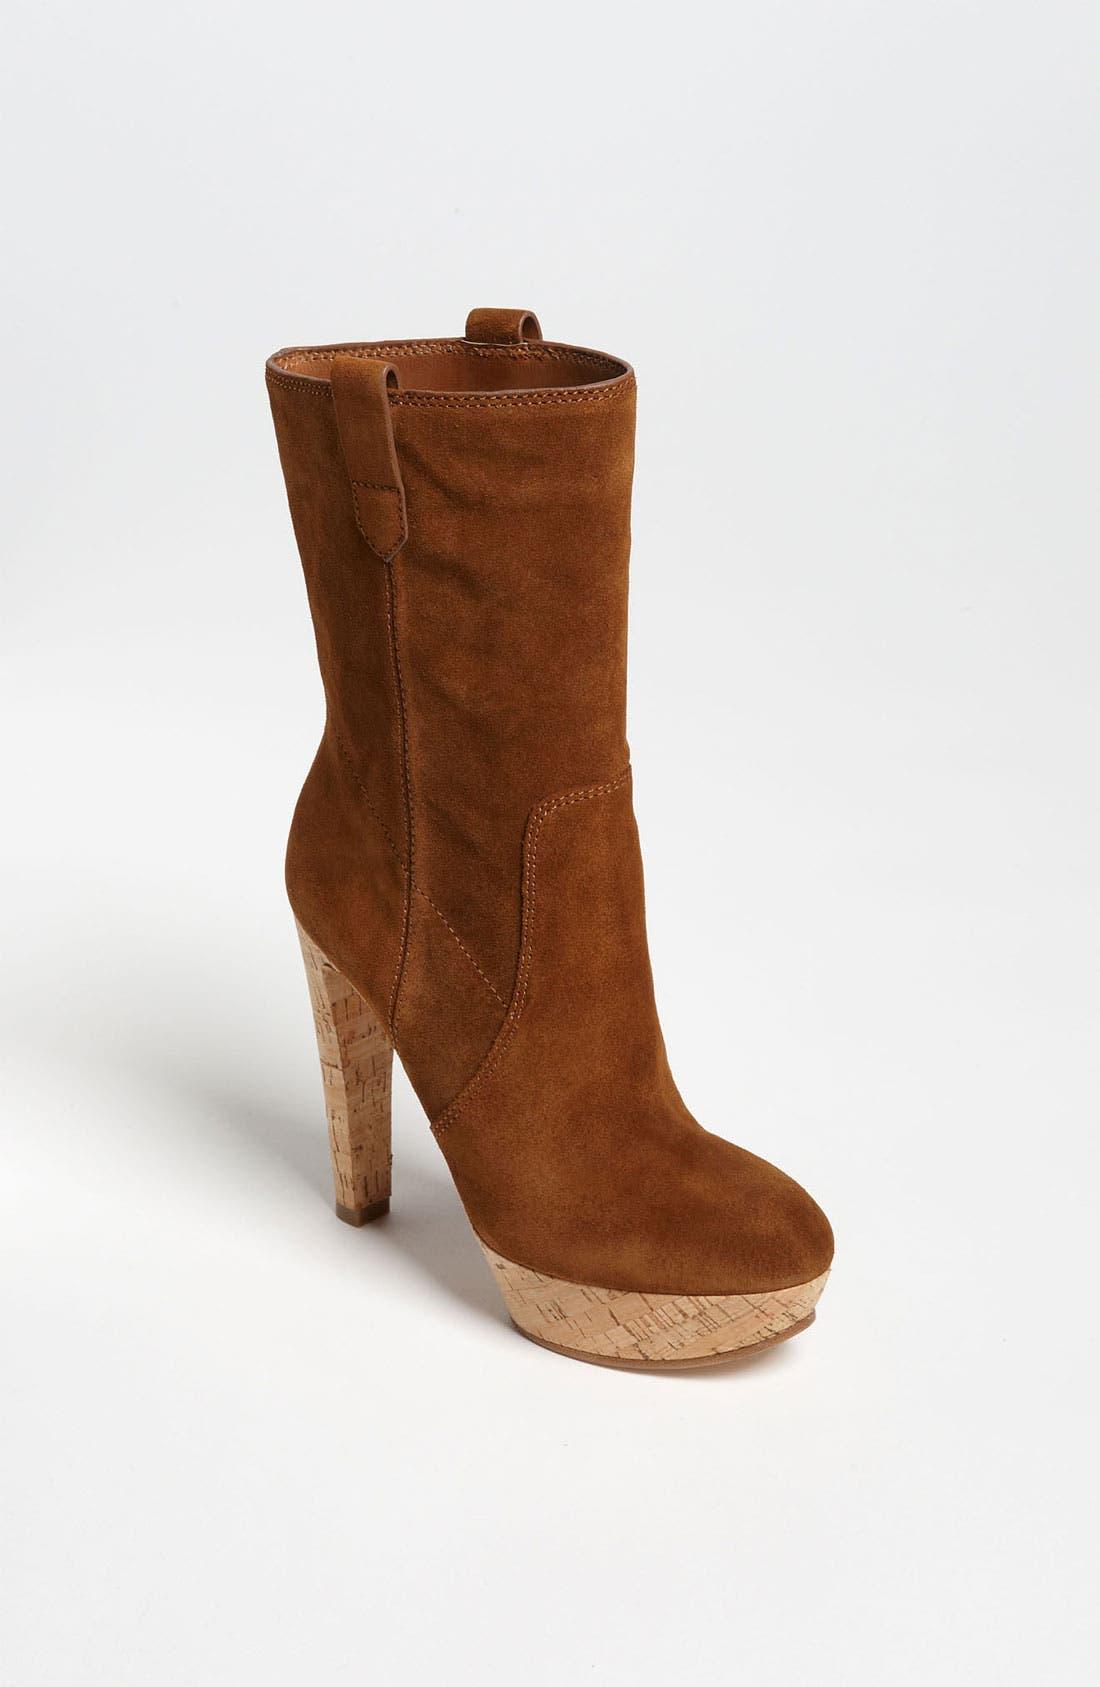 Main Image - KORS Michael Kors 'Brielle' Boot